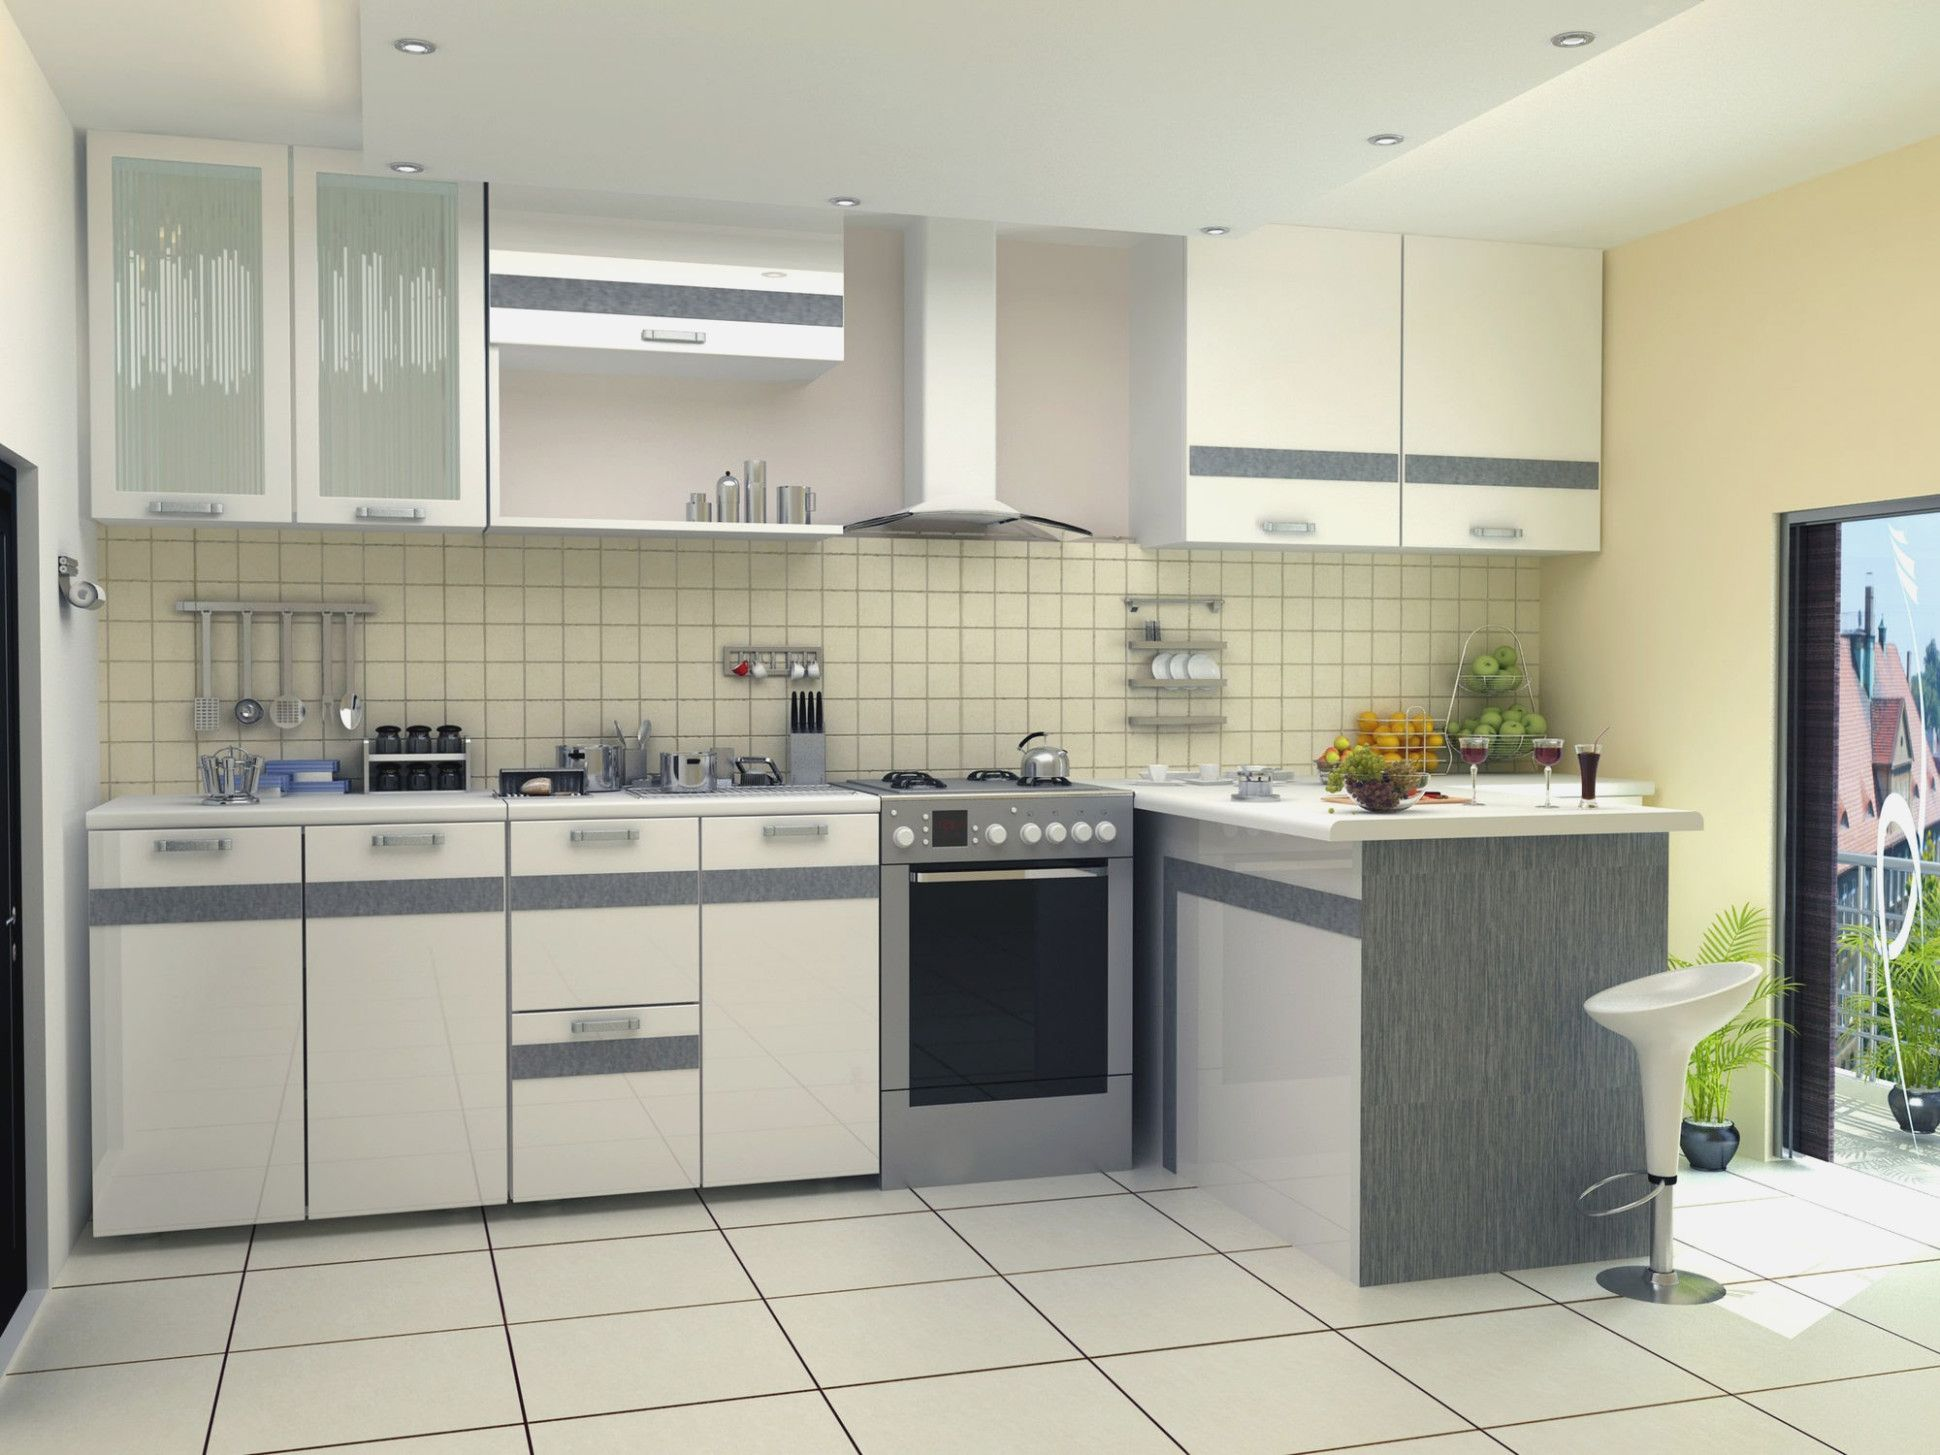 Kitchen Designer Software Replacing Cabinet Doors Planner Youtube Free 3d Design Online